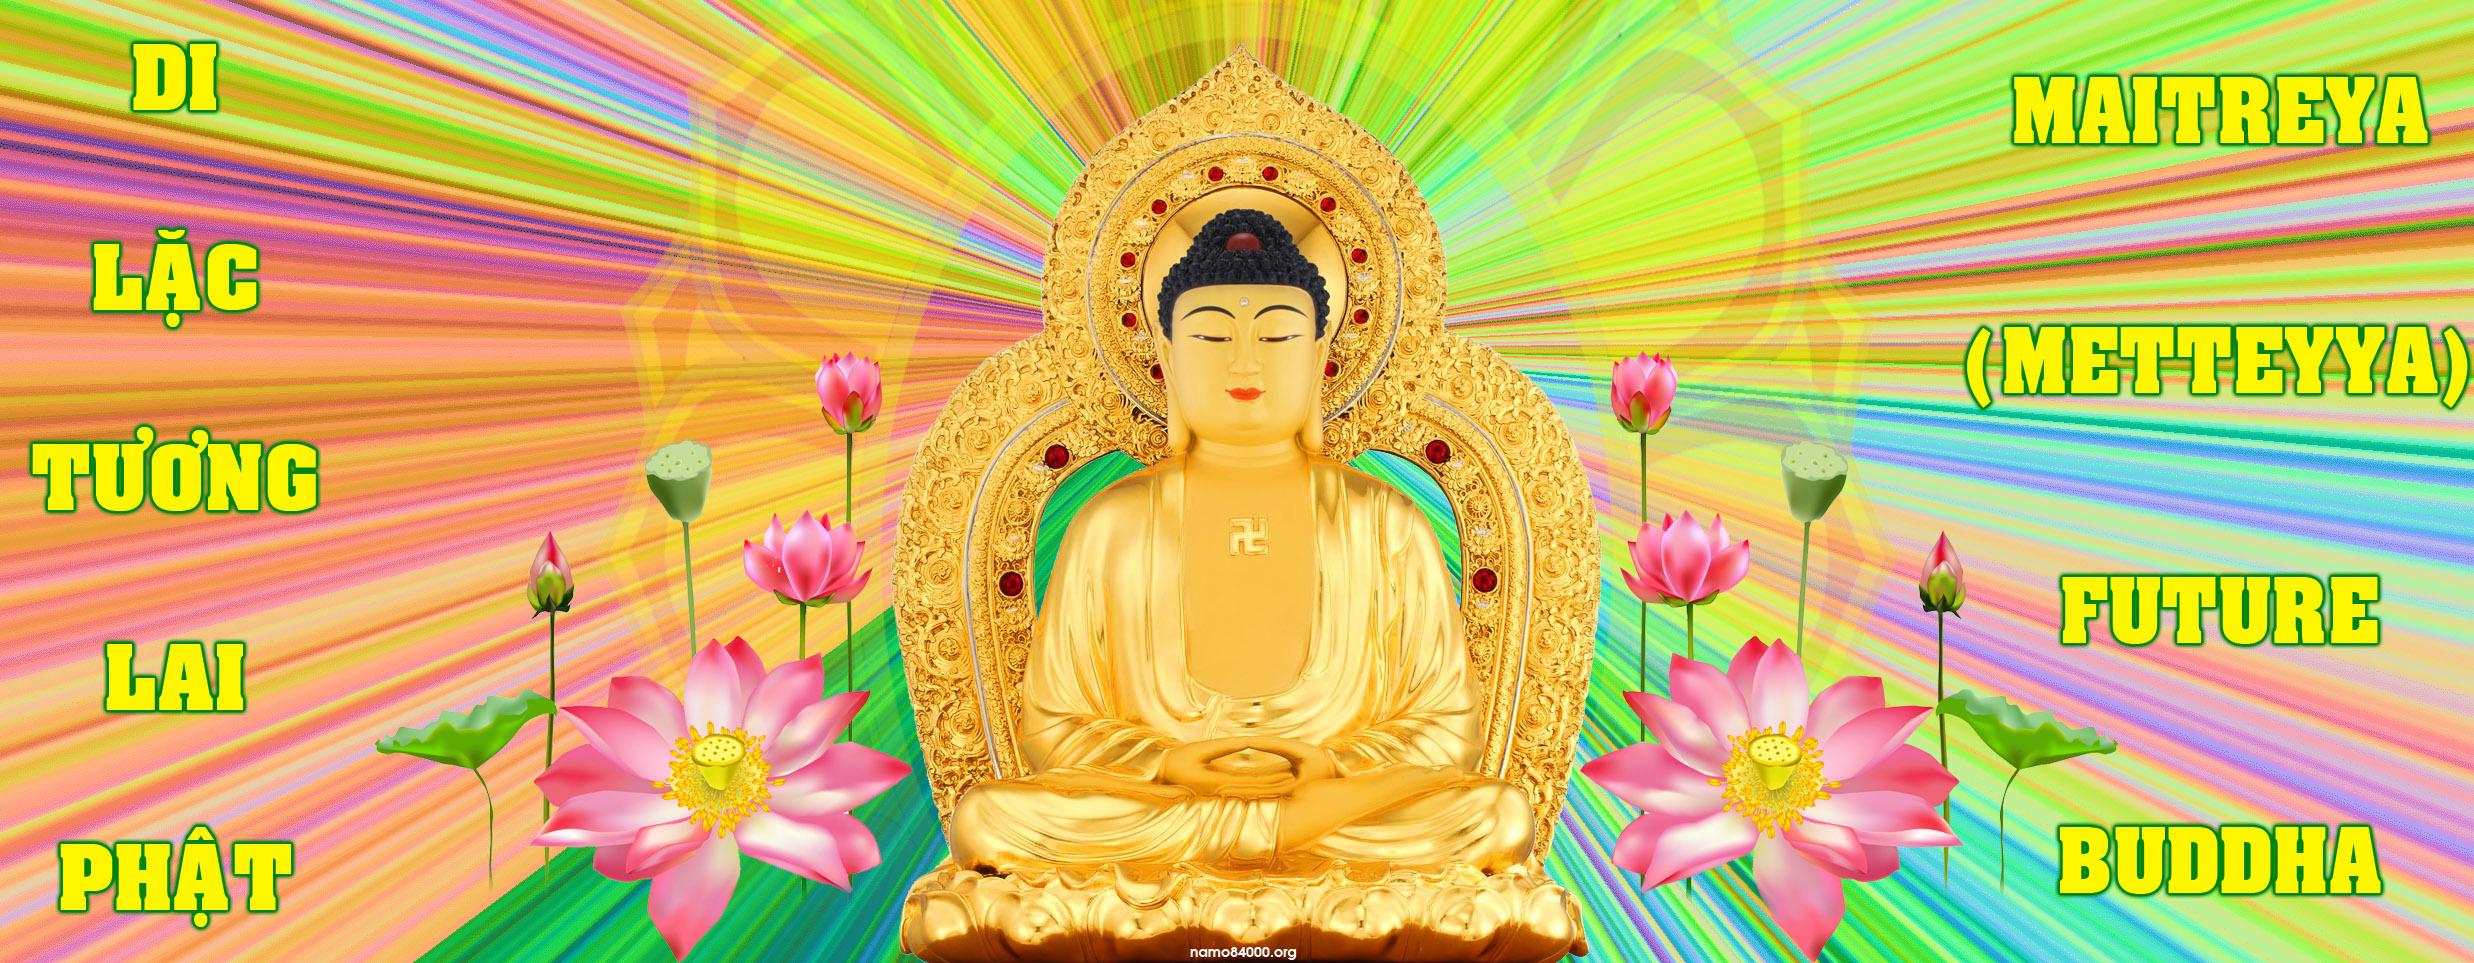 Di Lặc Tương Lai Phật